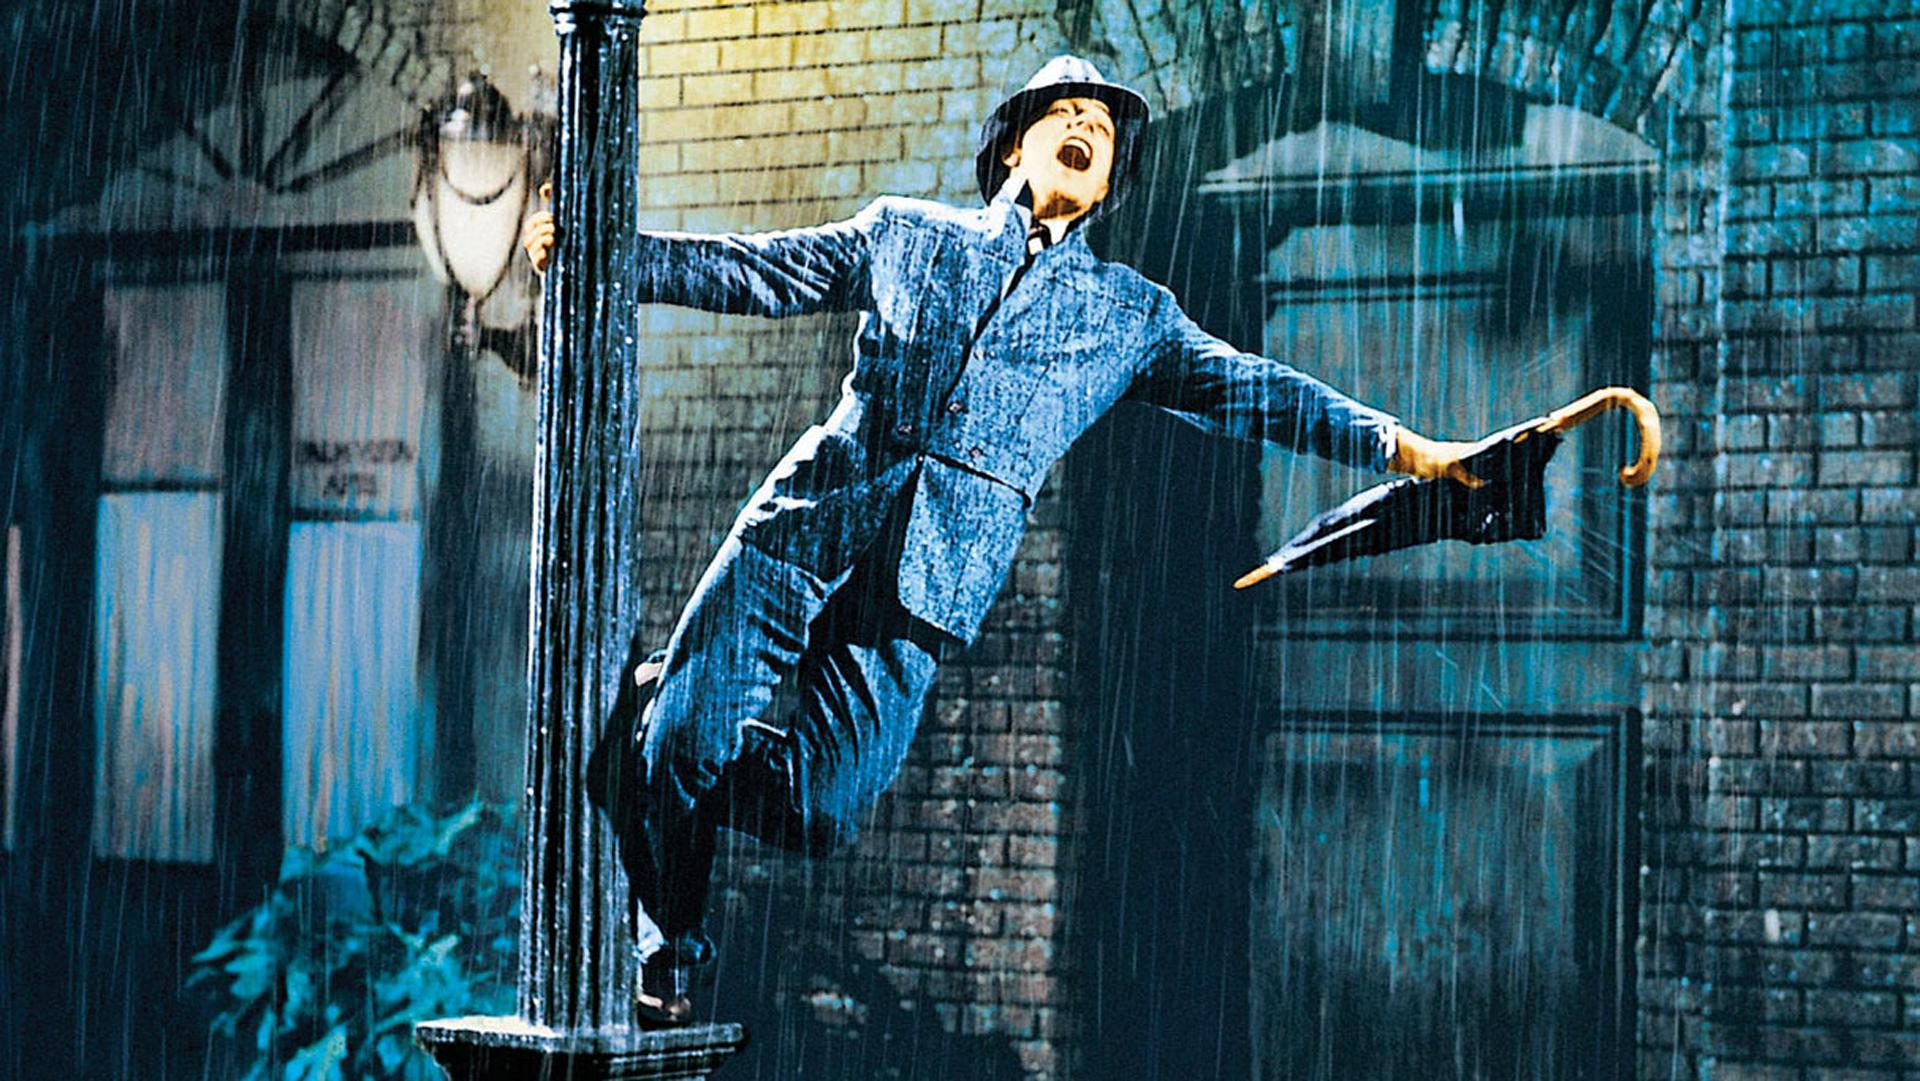 Trent Film Society presents: Singin' in the Rain